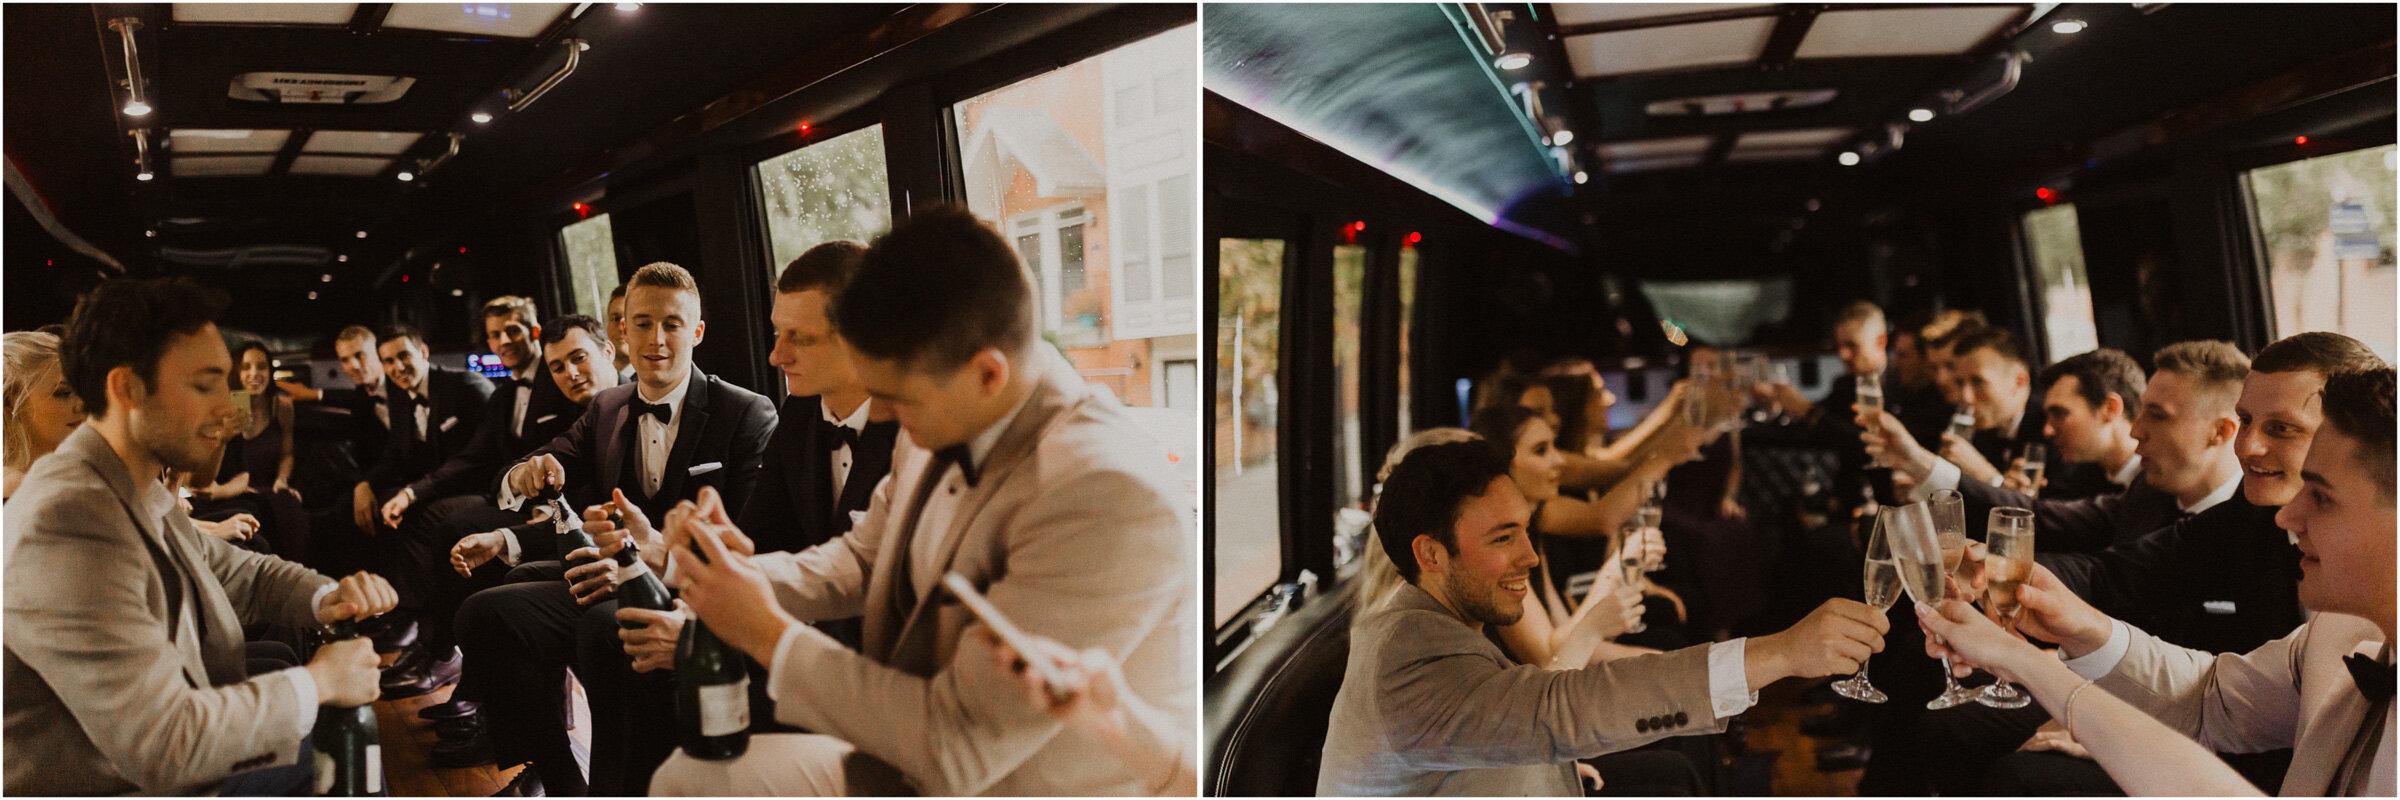 alyssa barletter photography downtown kansas city wedding boulevard brewery reception rainy day wedding-44.jpg